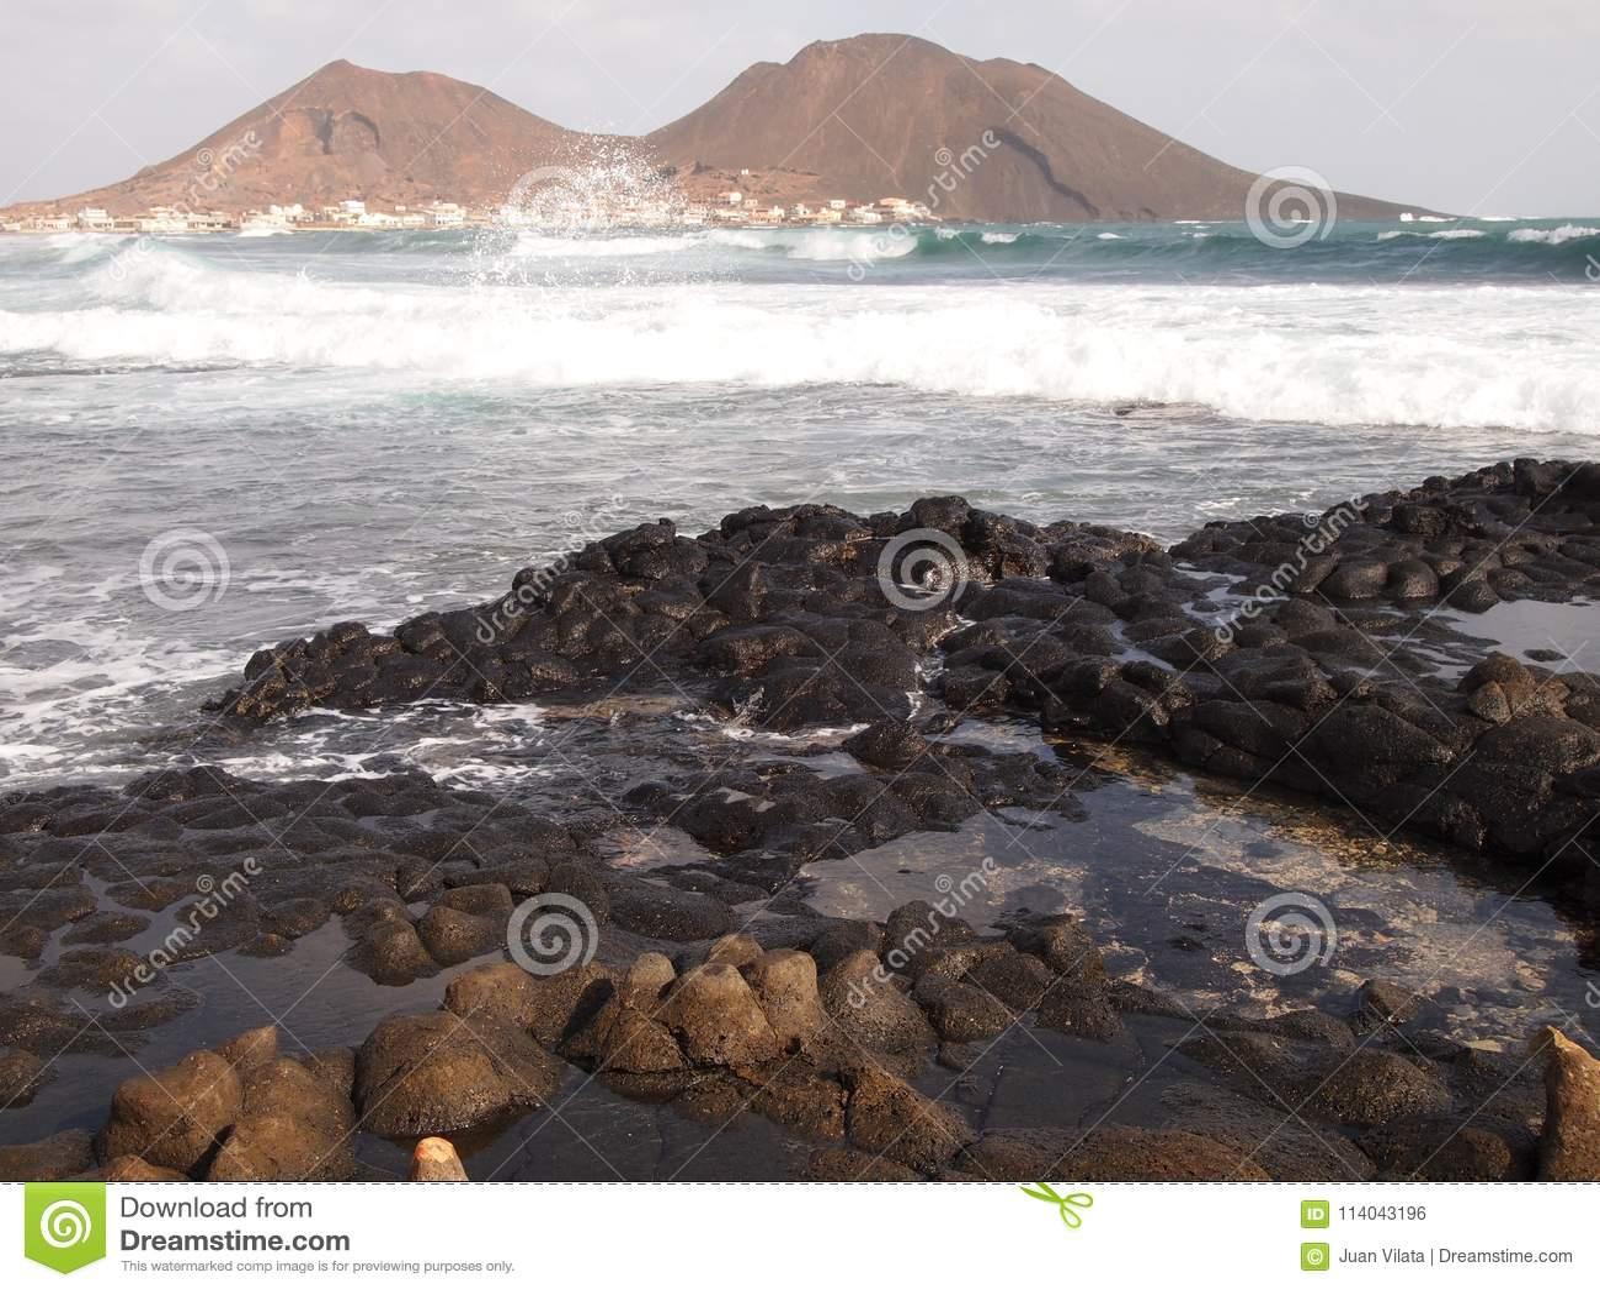 super qualité beauté 2019 real The Village Of Calhau In Sao Vicente, One Of The Cape Verde ...